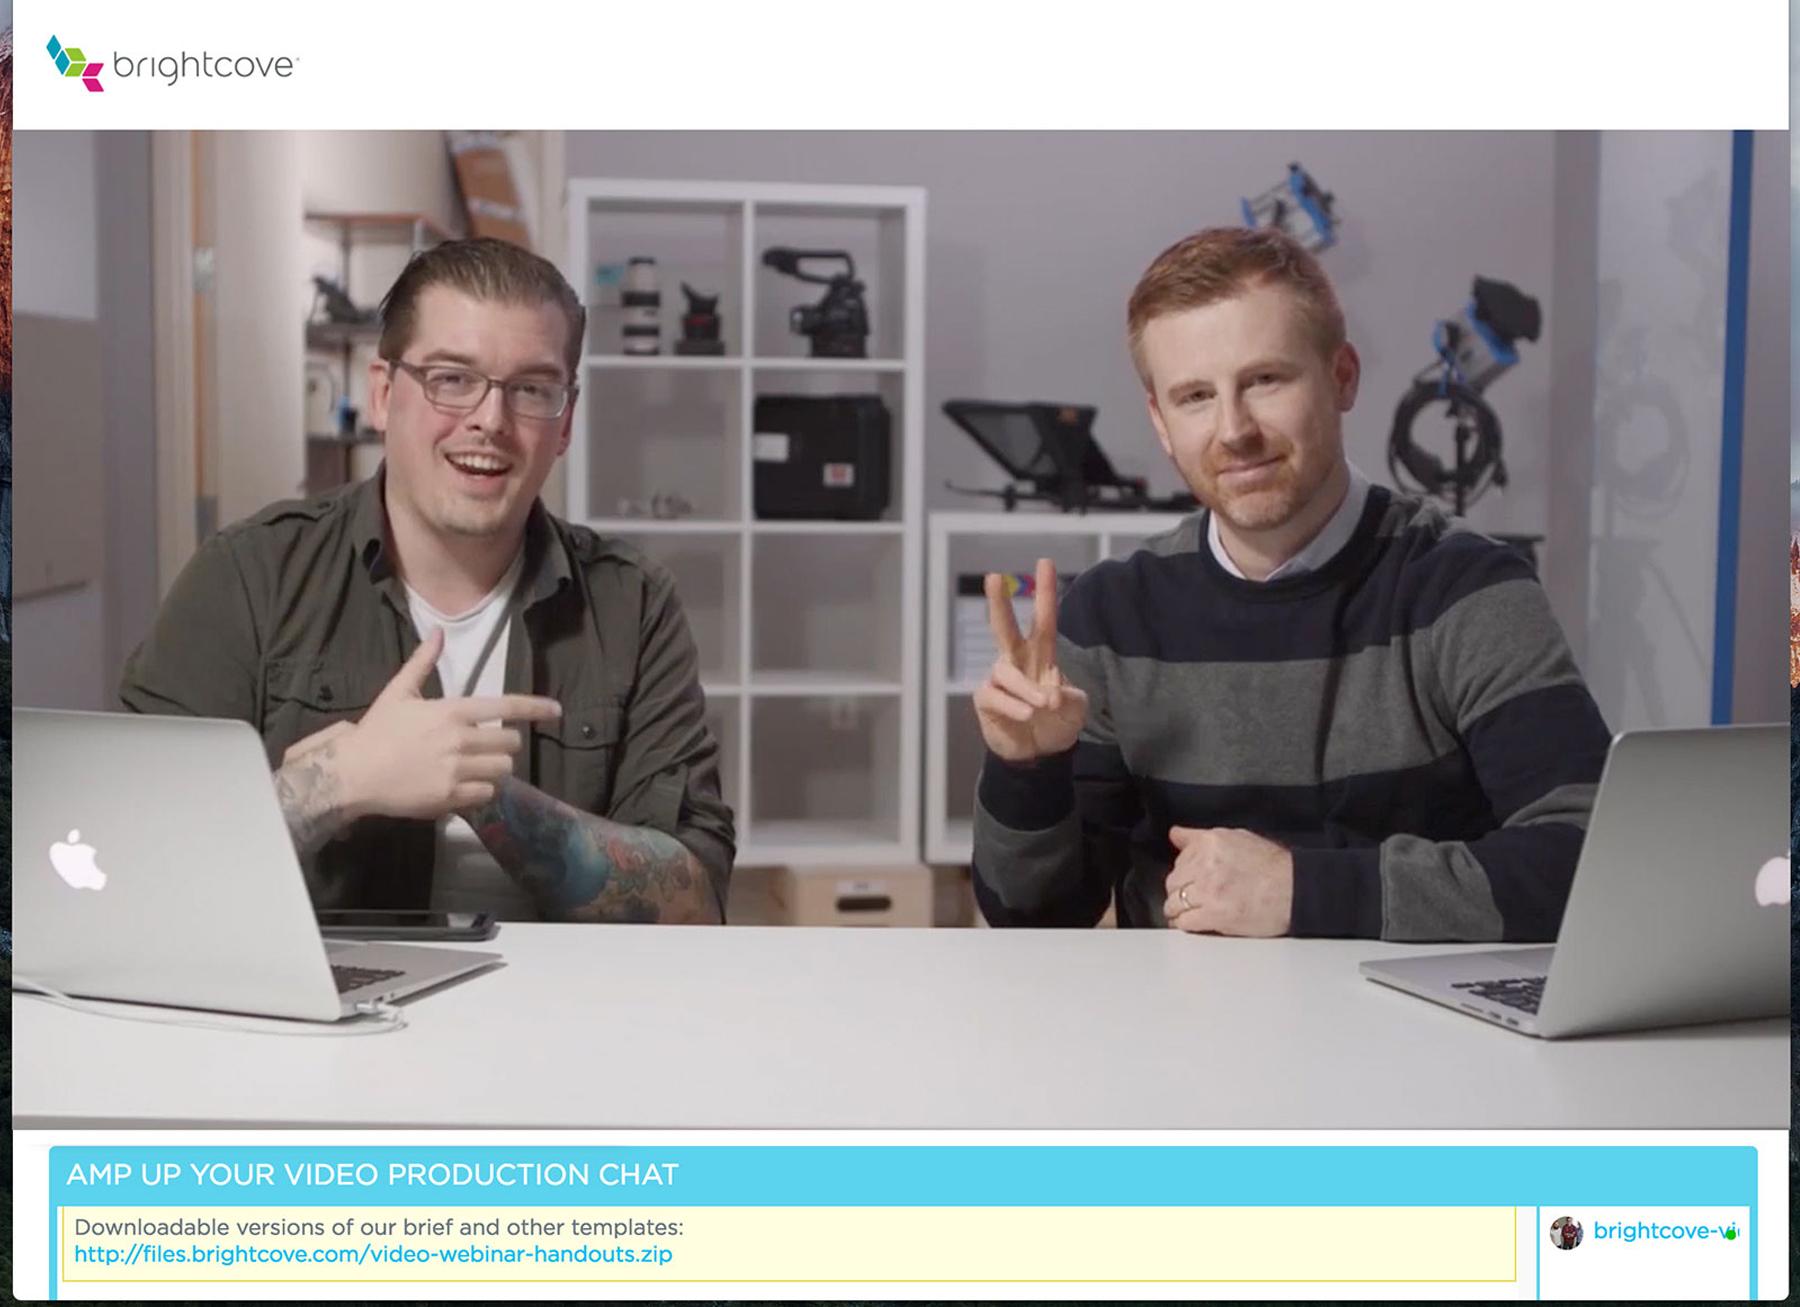 Brightcove Blog - The Leading Online Video Hosting Platform